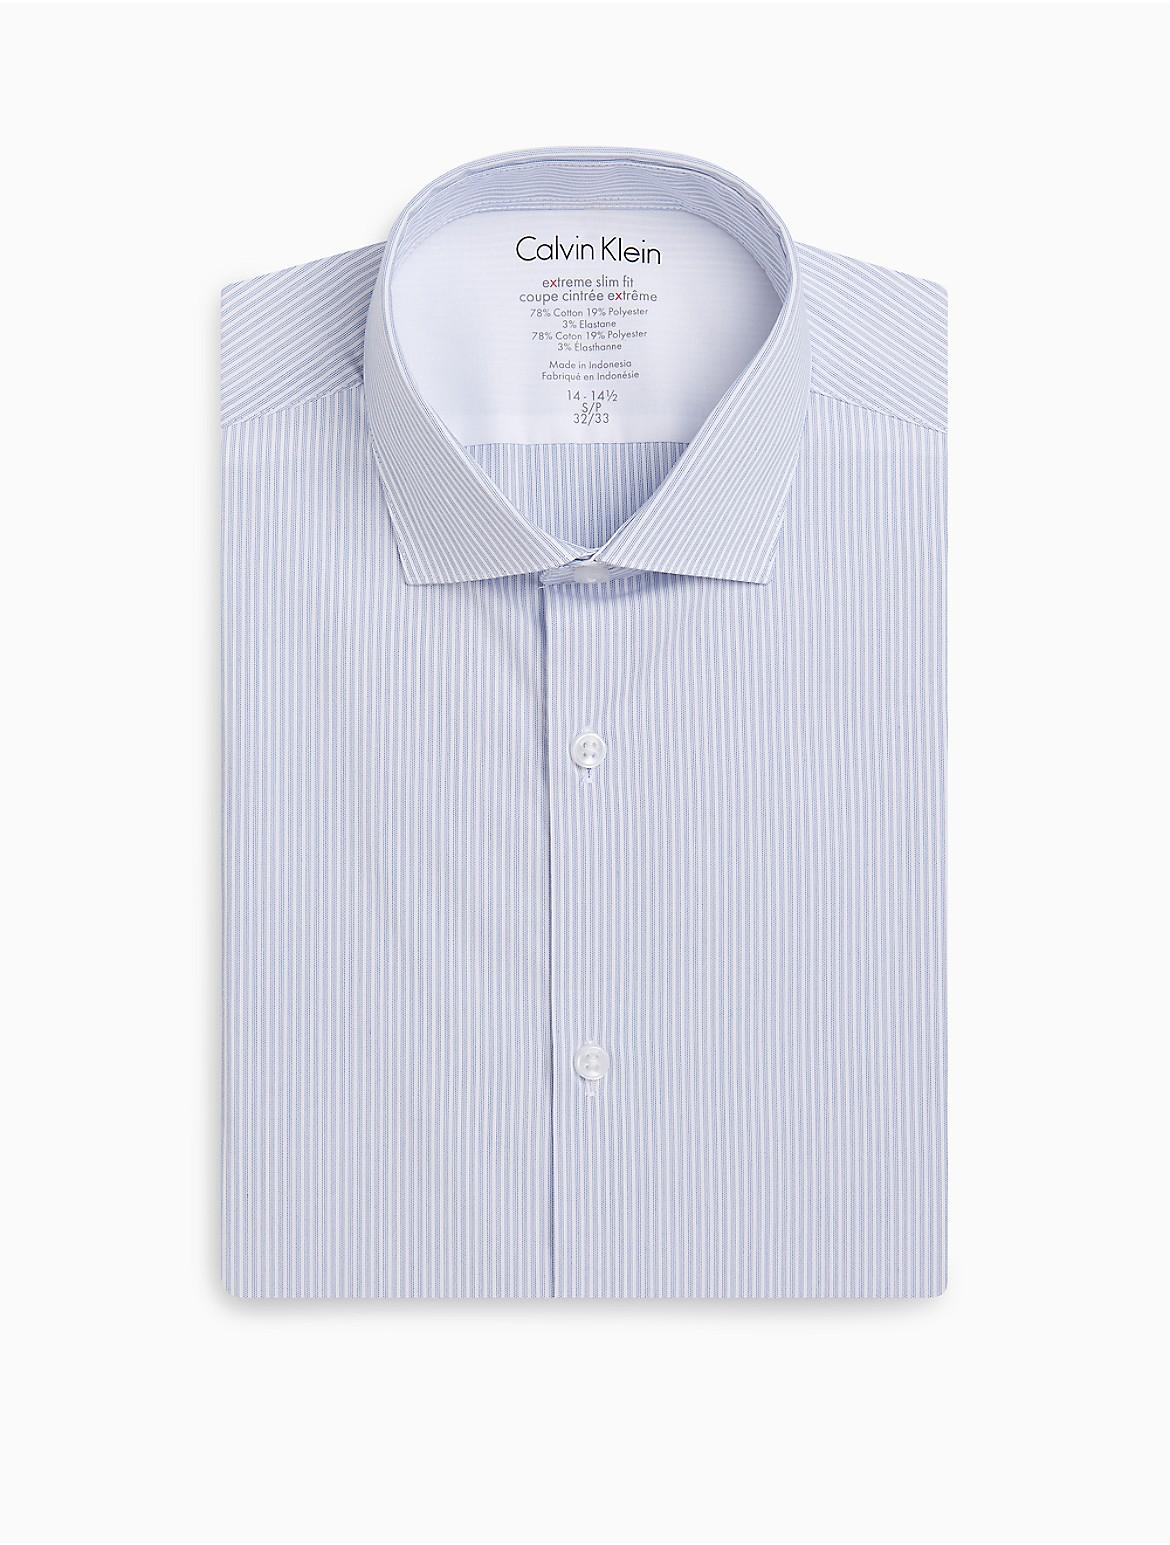 X Fit Ultra Slim Fit Blue White Plaid Dress Shirt Calvin Klein